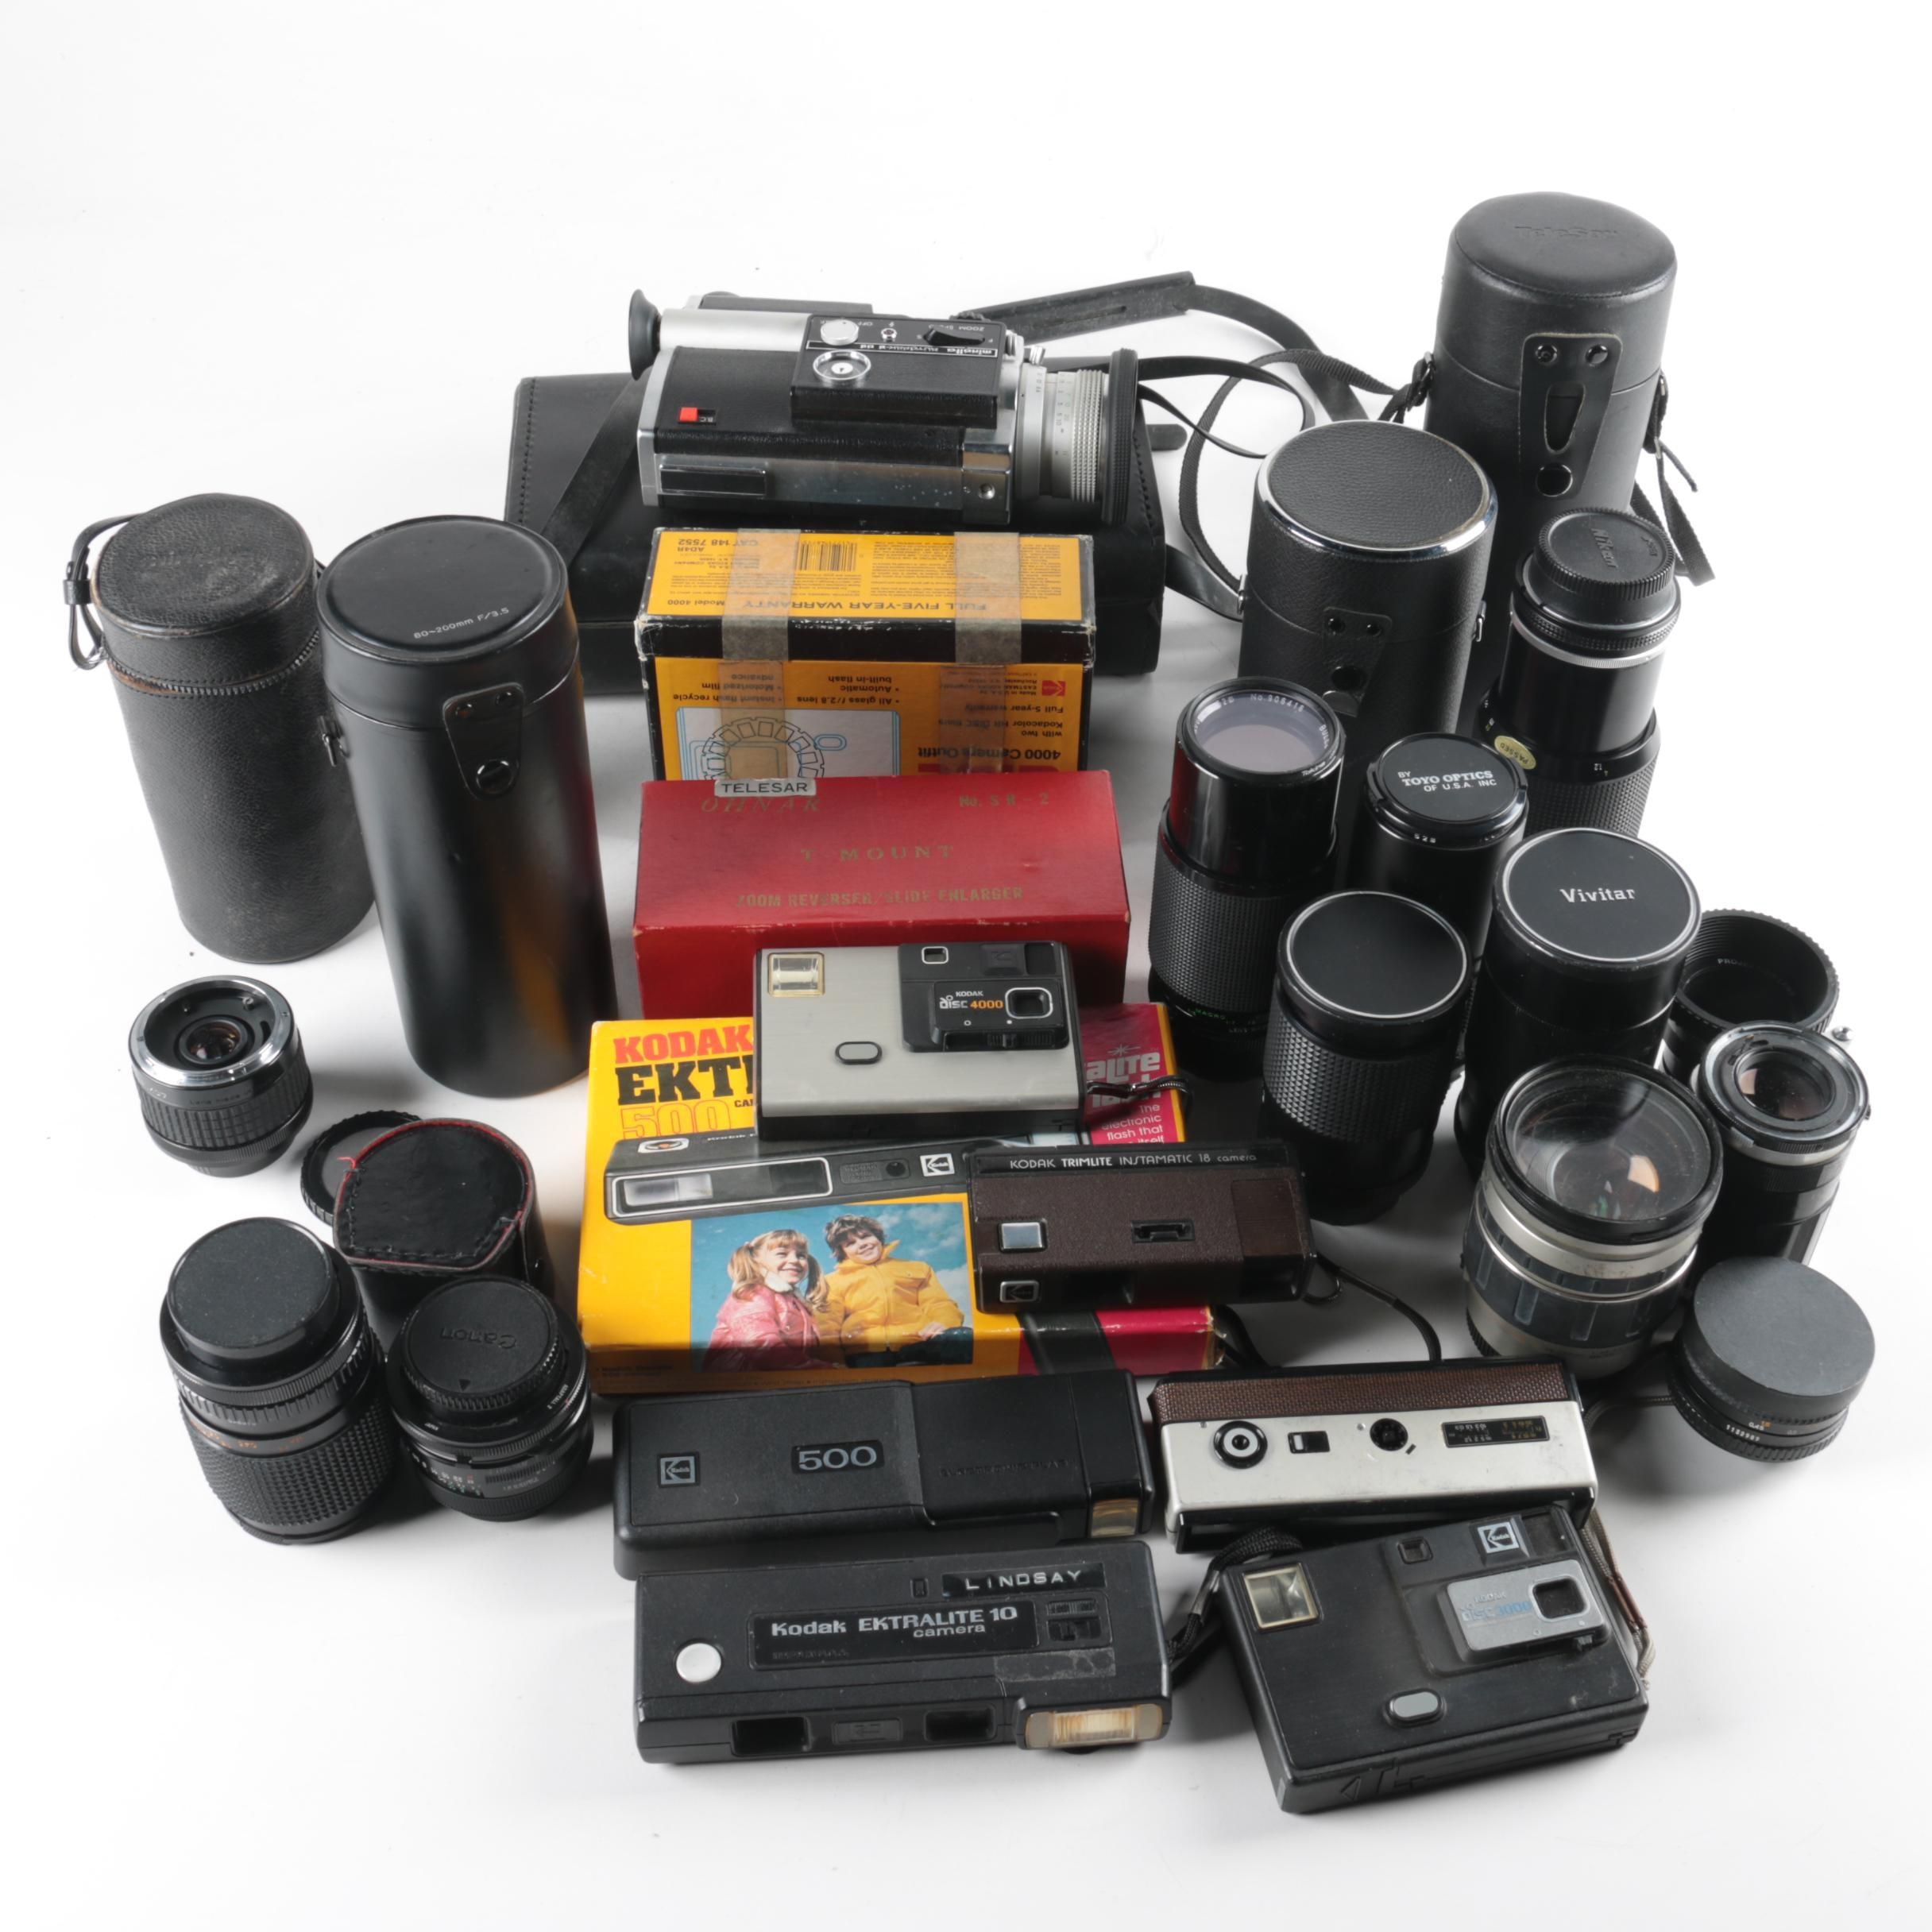 Vintage Cameras with Accessories